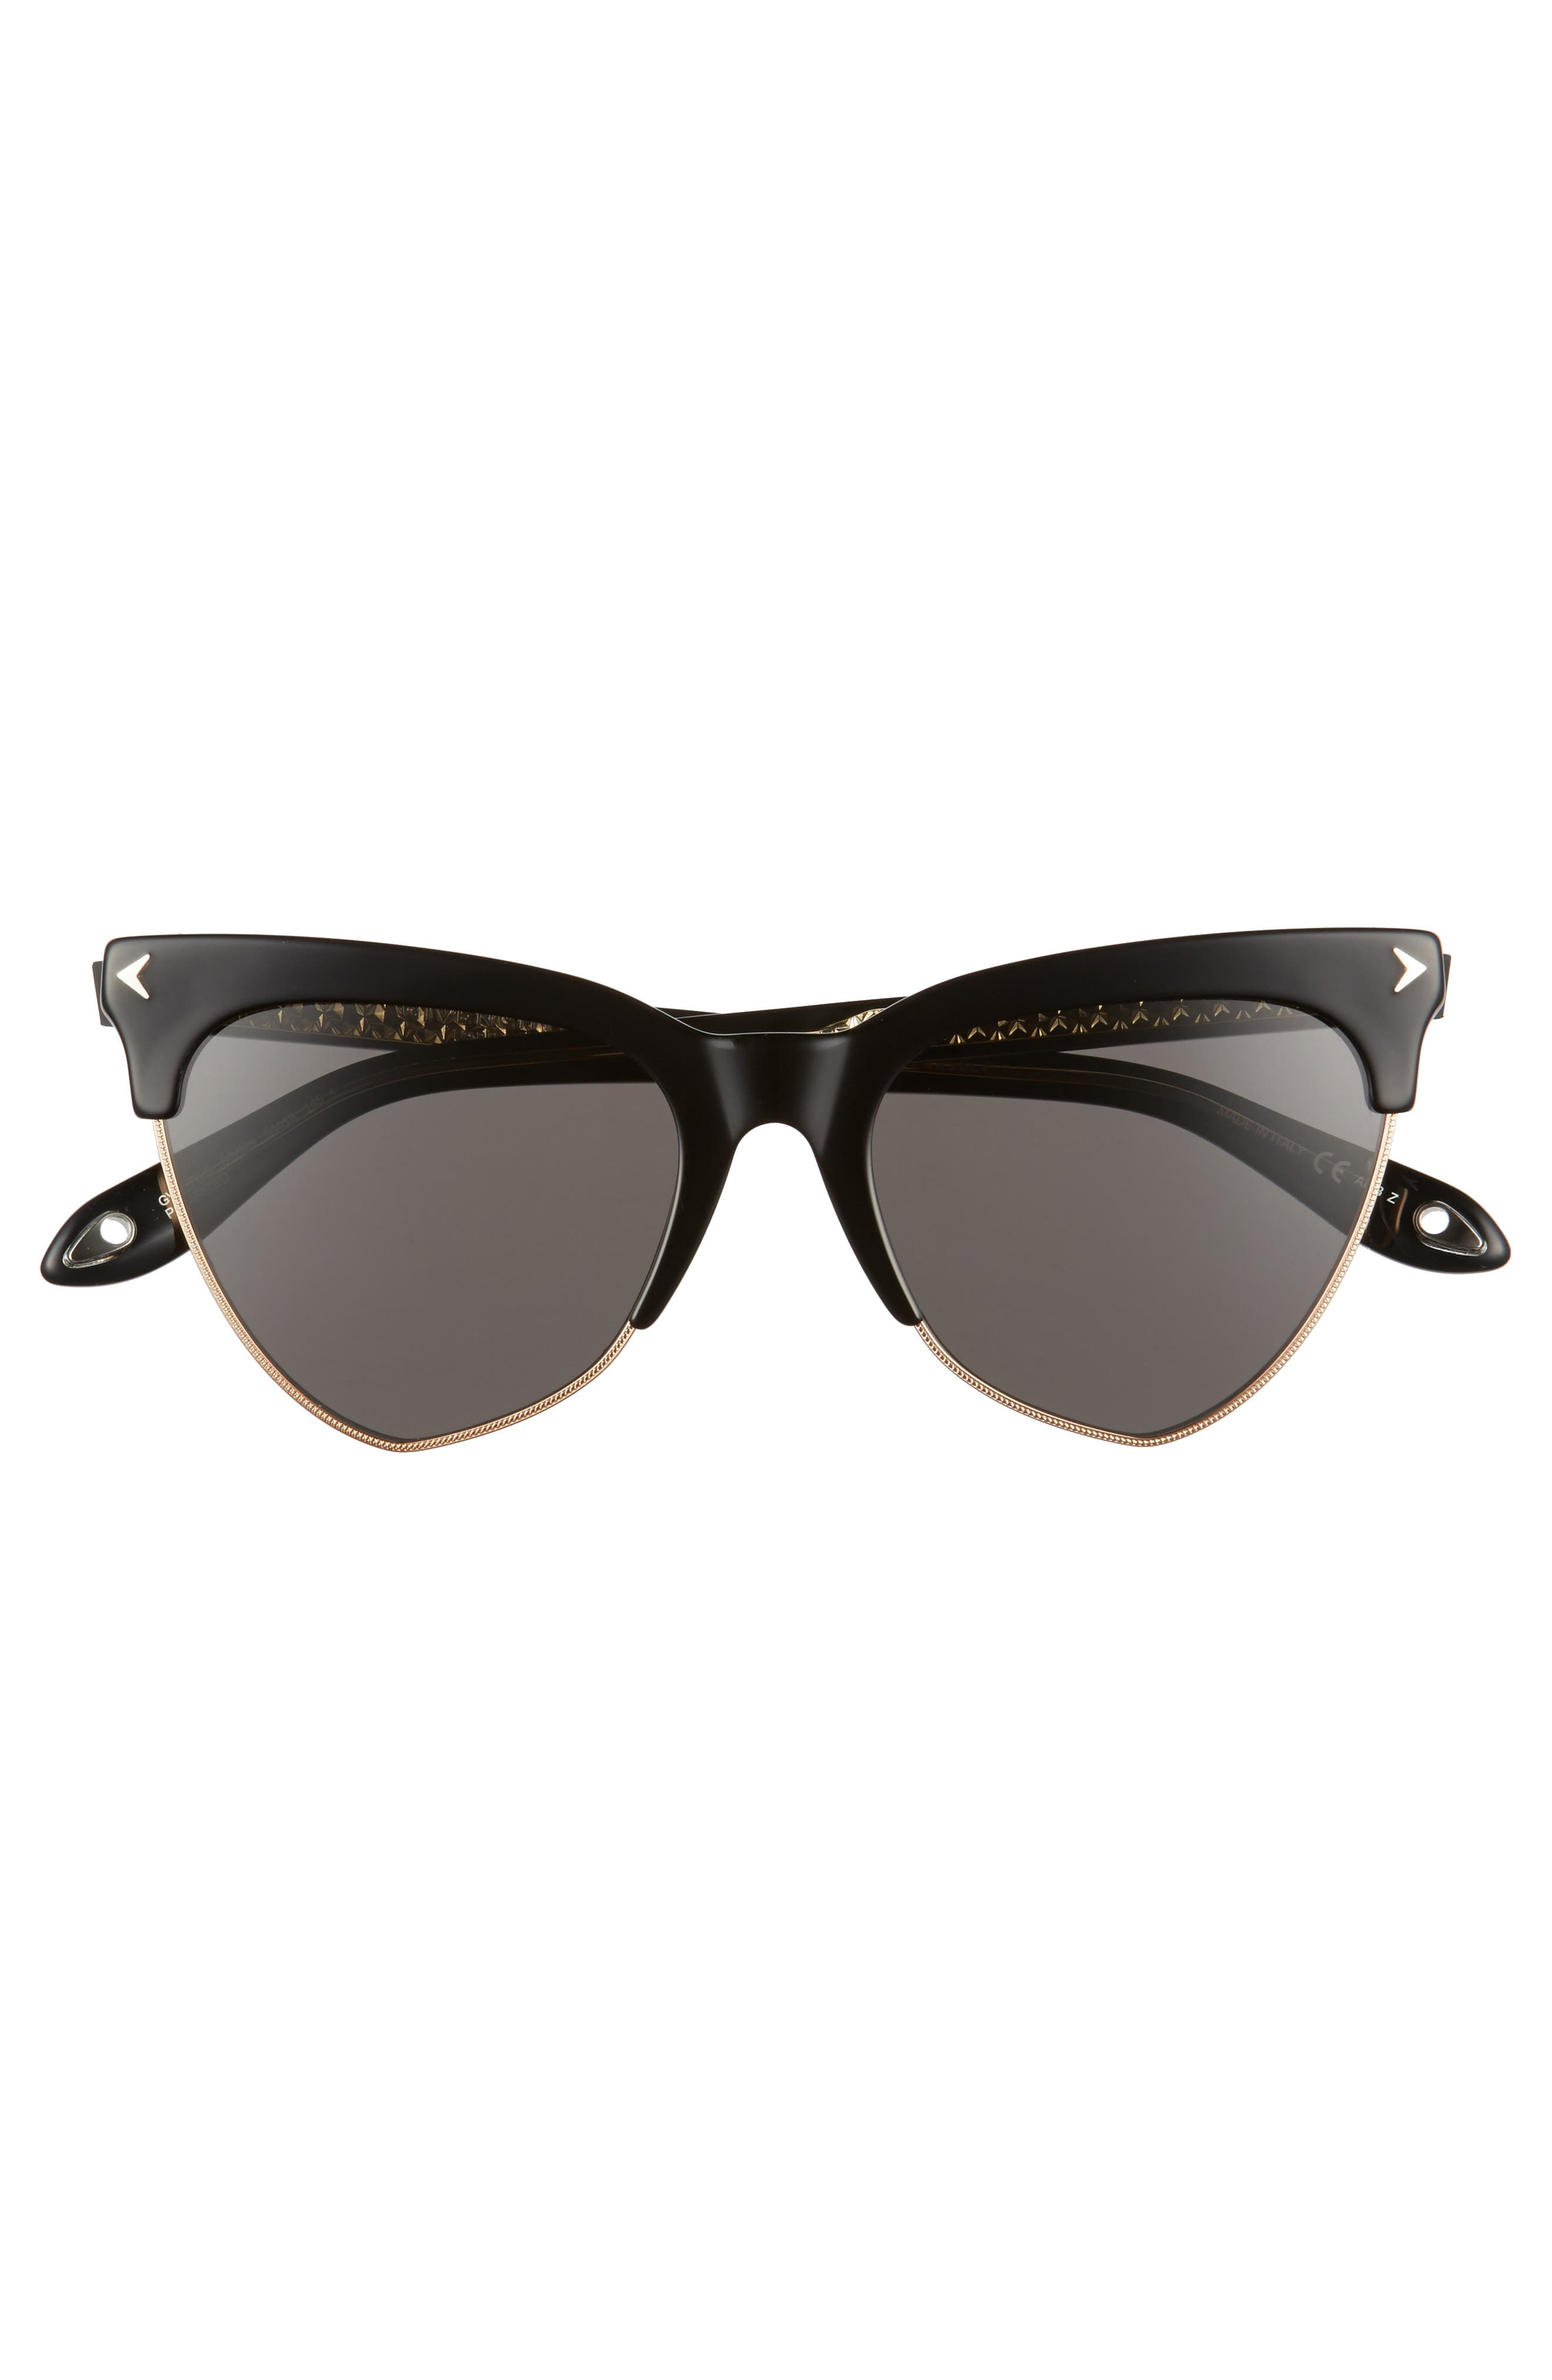 54mm Polarized Cat Eye Sunglasses,                             Alternate thumbnail 3, color,                             001